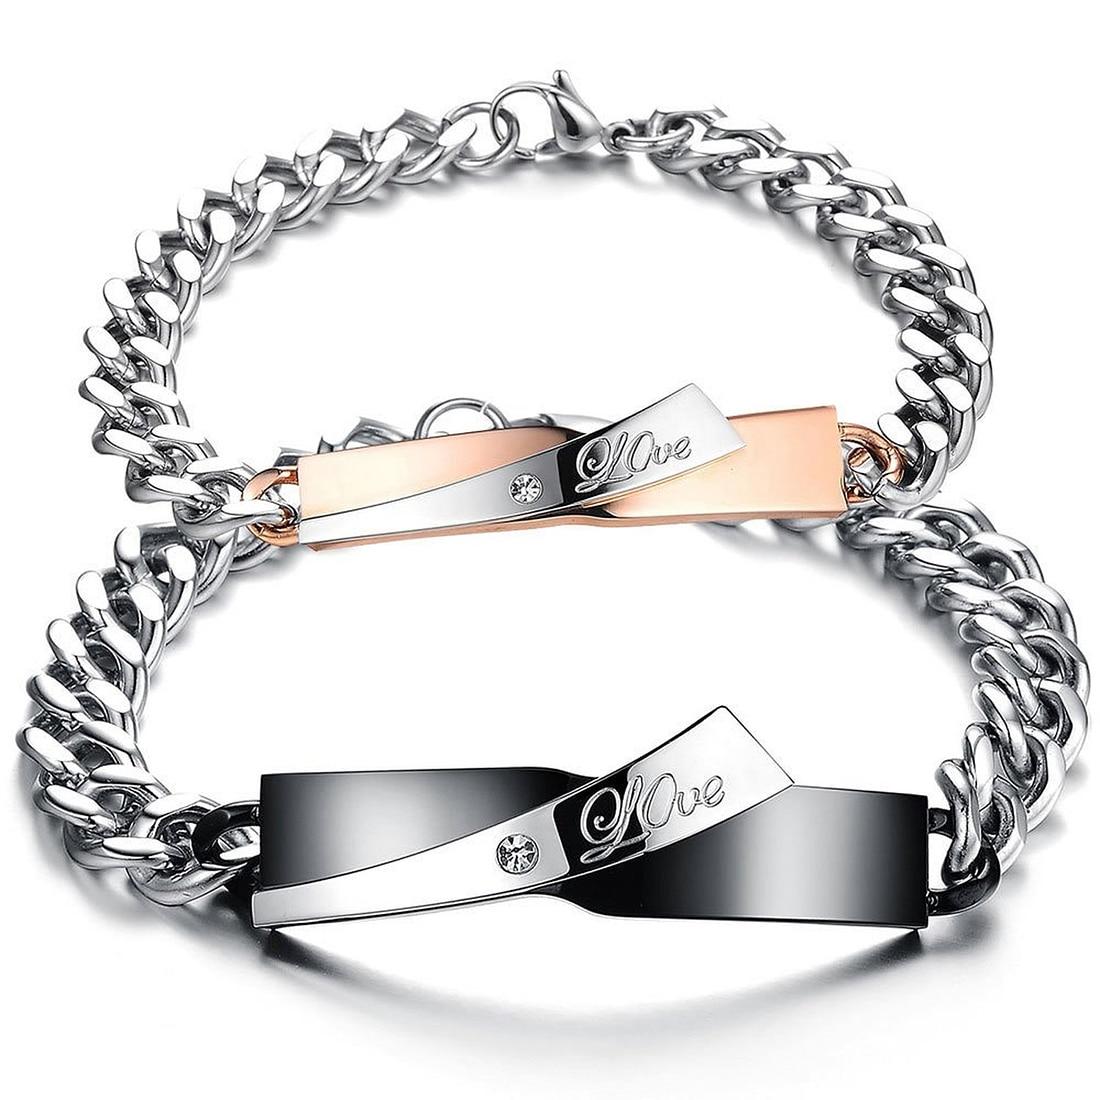 font b Jewelry b font 2 pcs Men s Women s Bracelet Valentine s Day